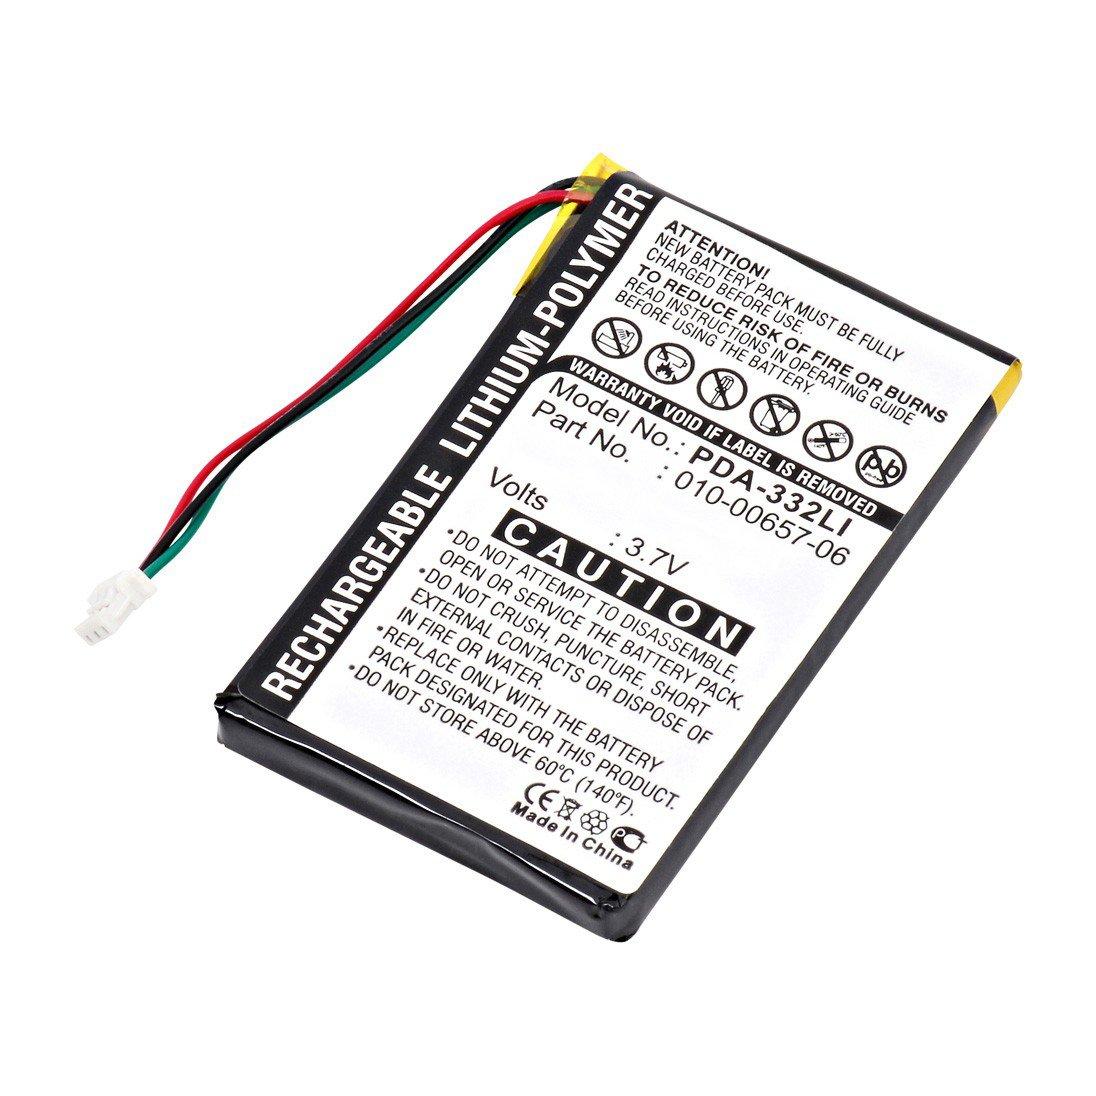 Replacement Garmin 010 06 Battery For Nuvi 770 Batterymart